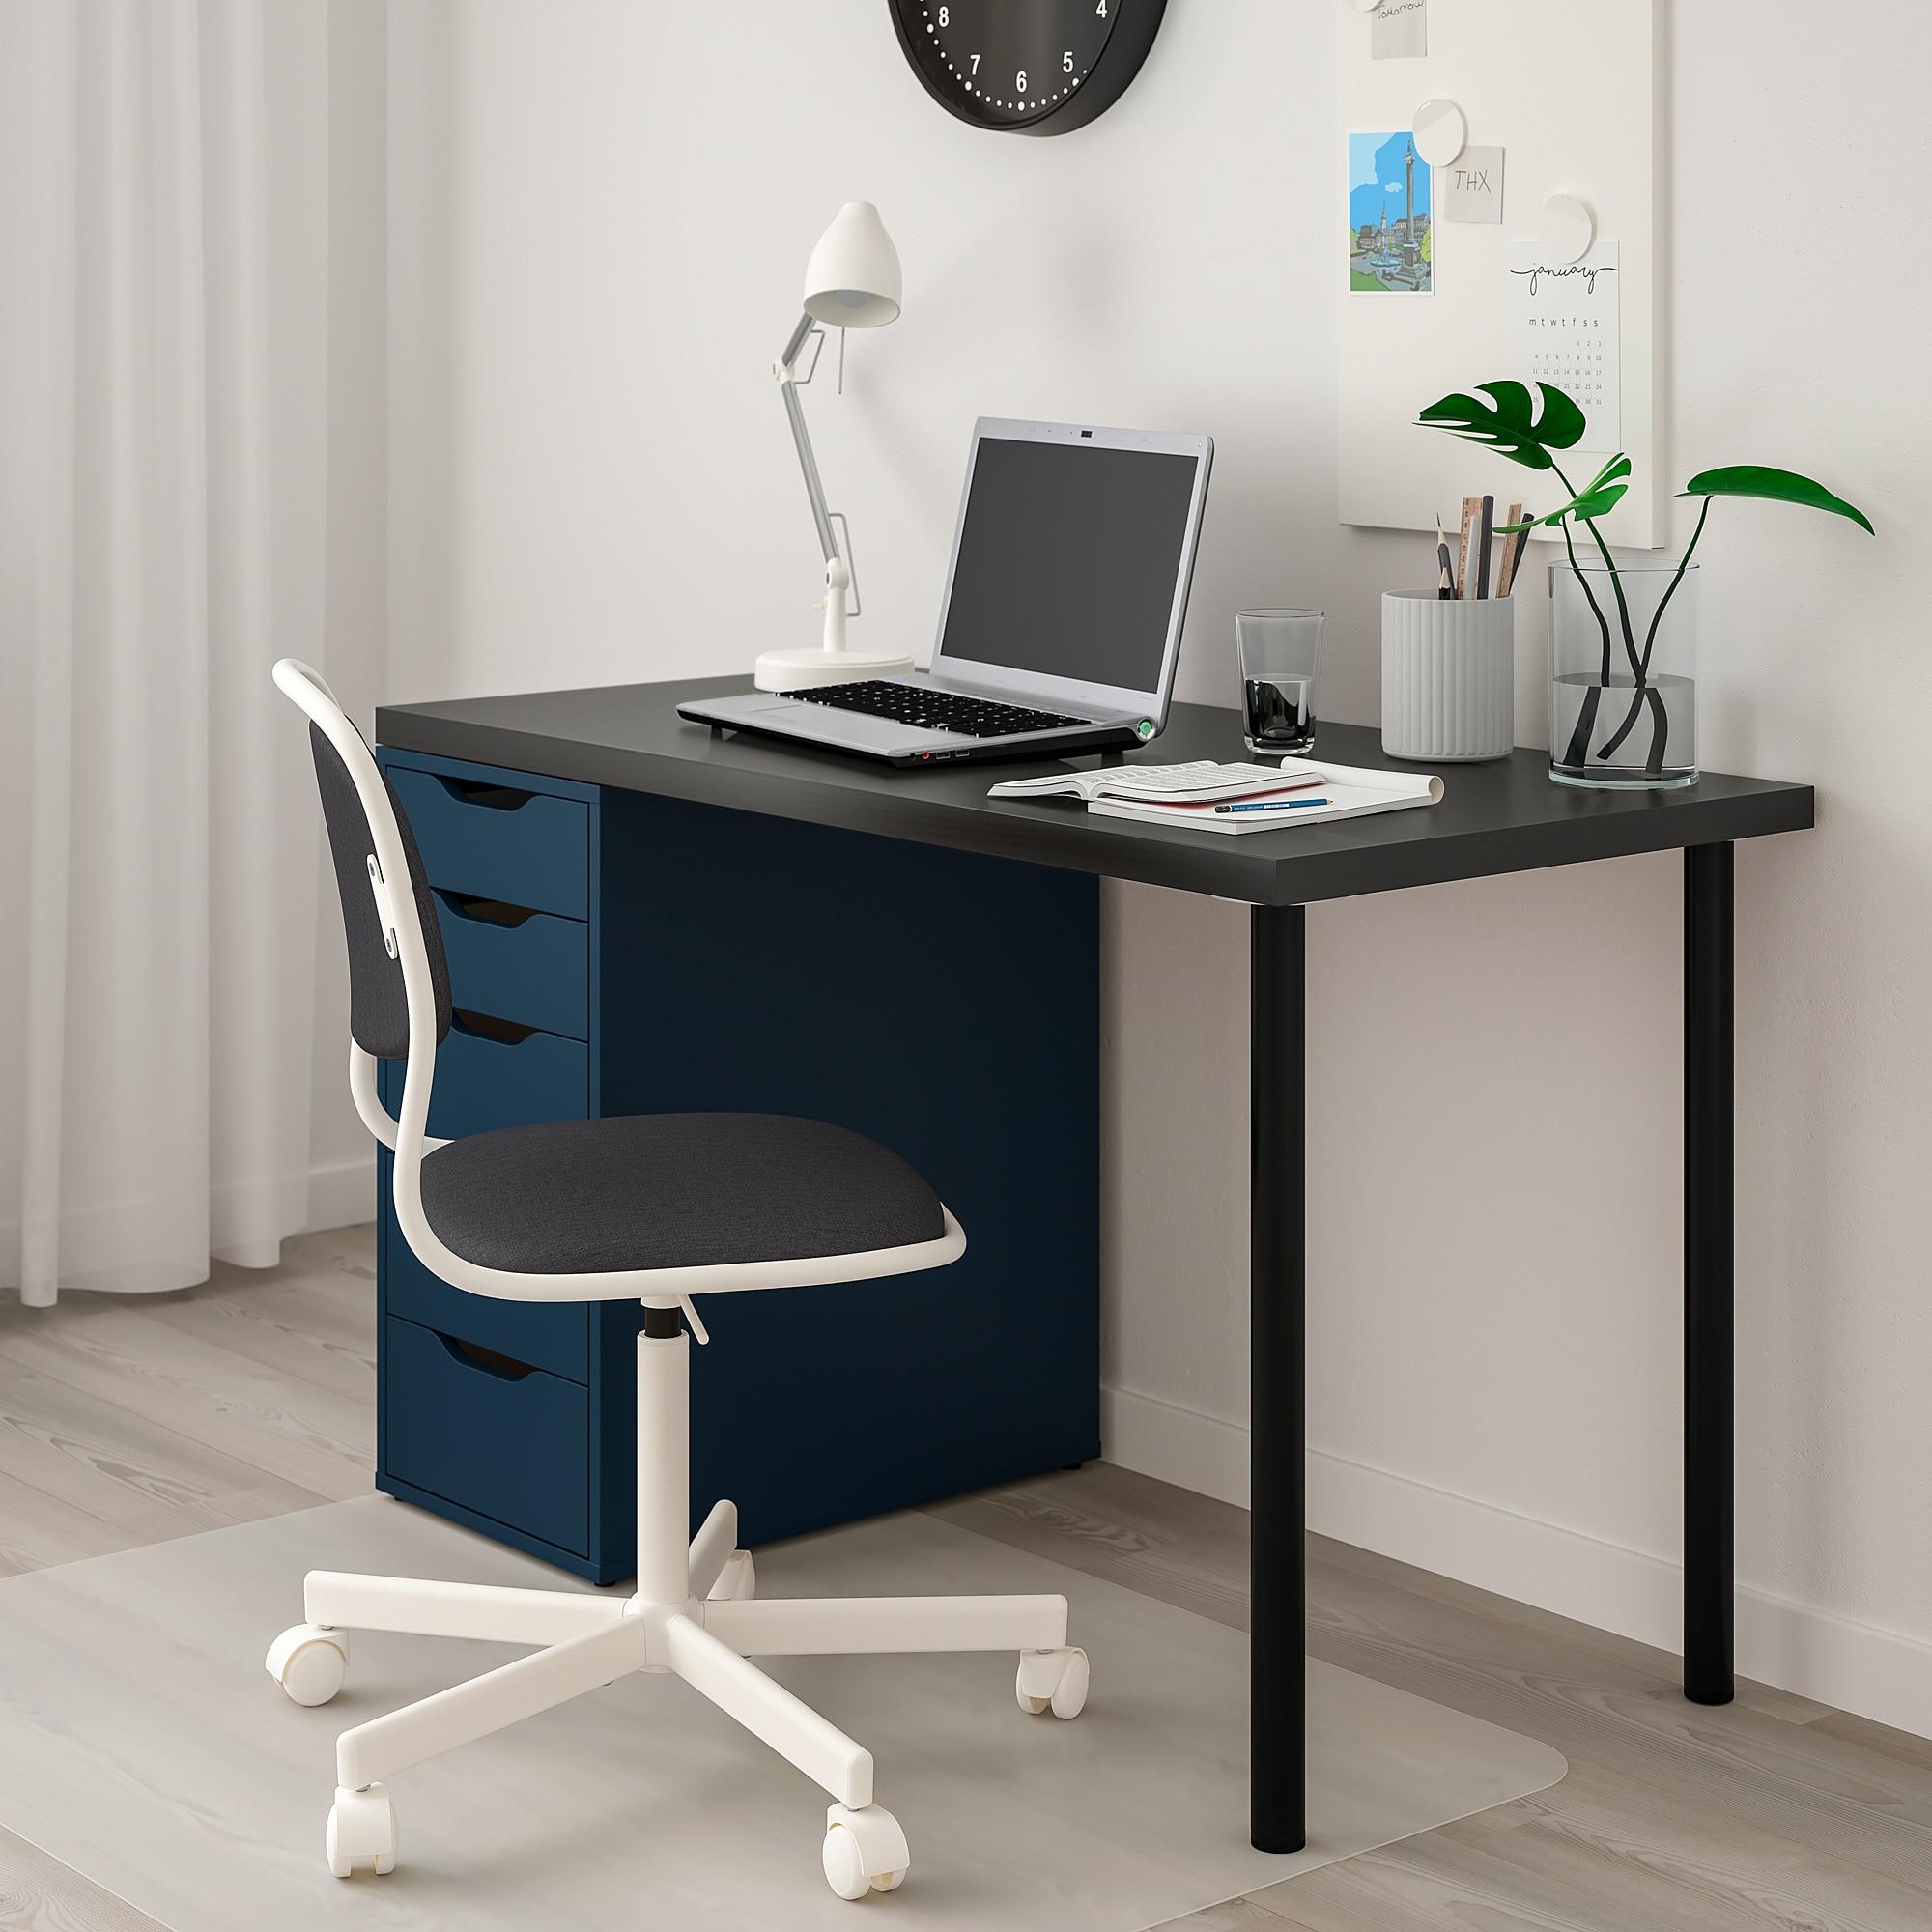 Linnmon Alex Table Black Brown Blue Ikea White Wood Desk Ikea Home